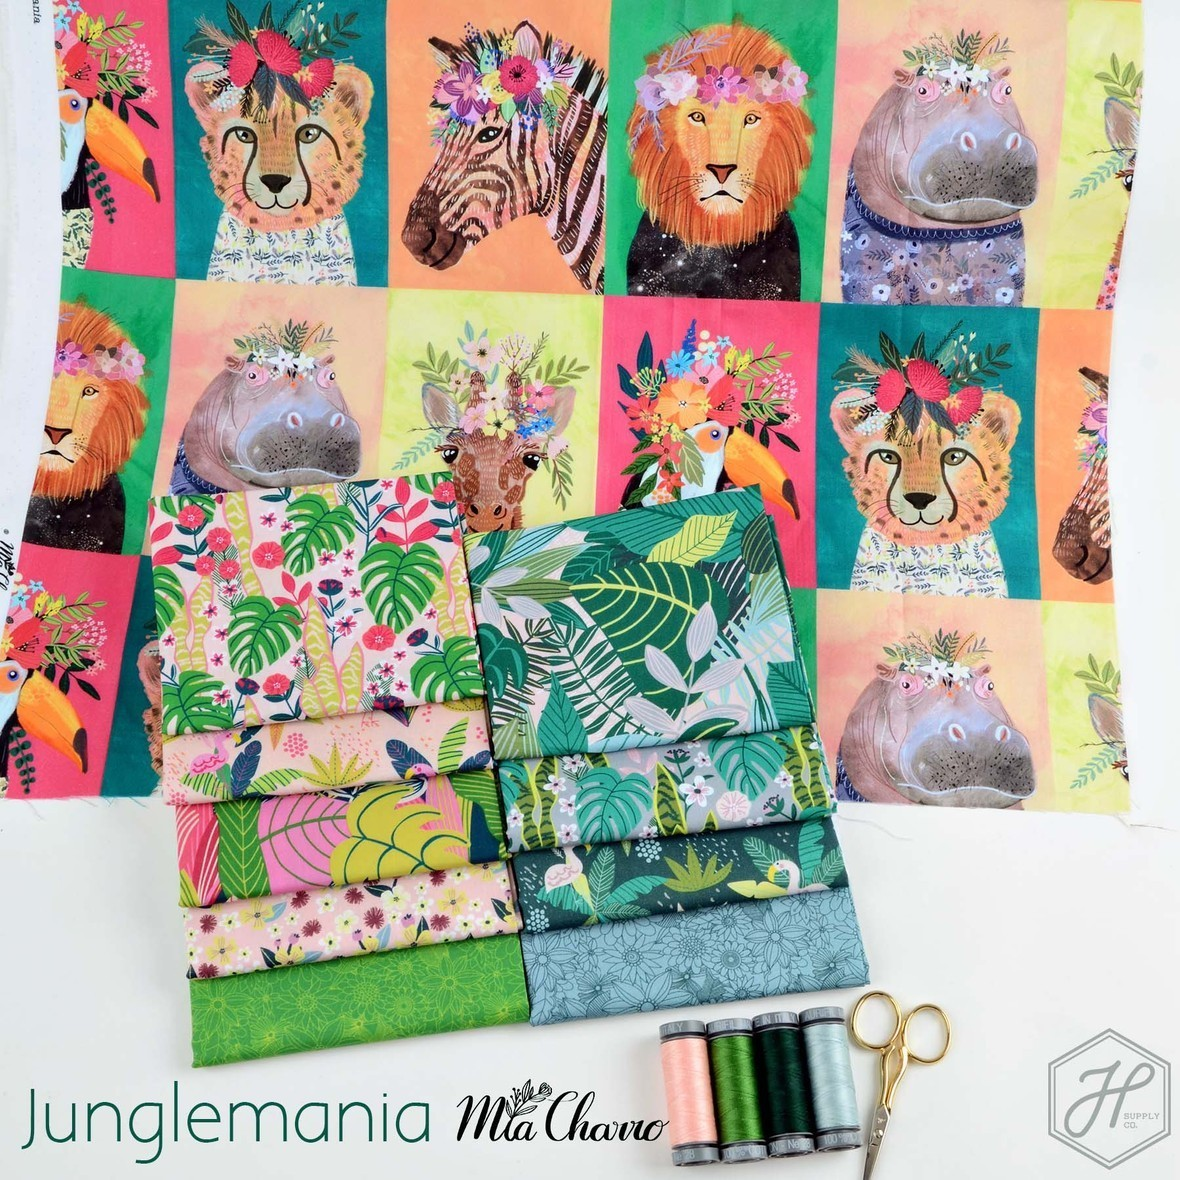 Junglemania Fabric Poster Mia Charro at Hawthorne Supply Co